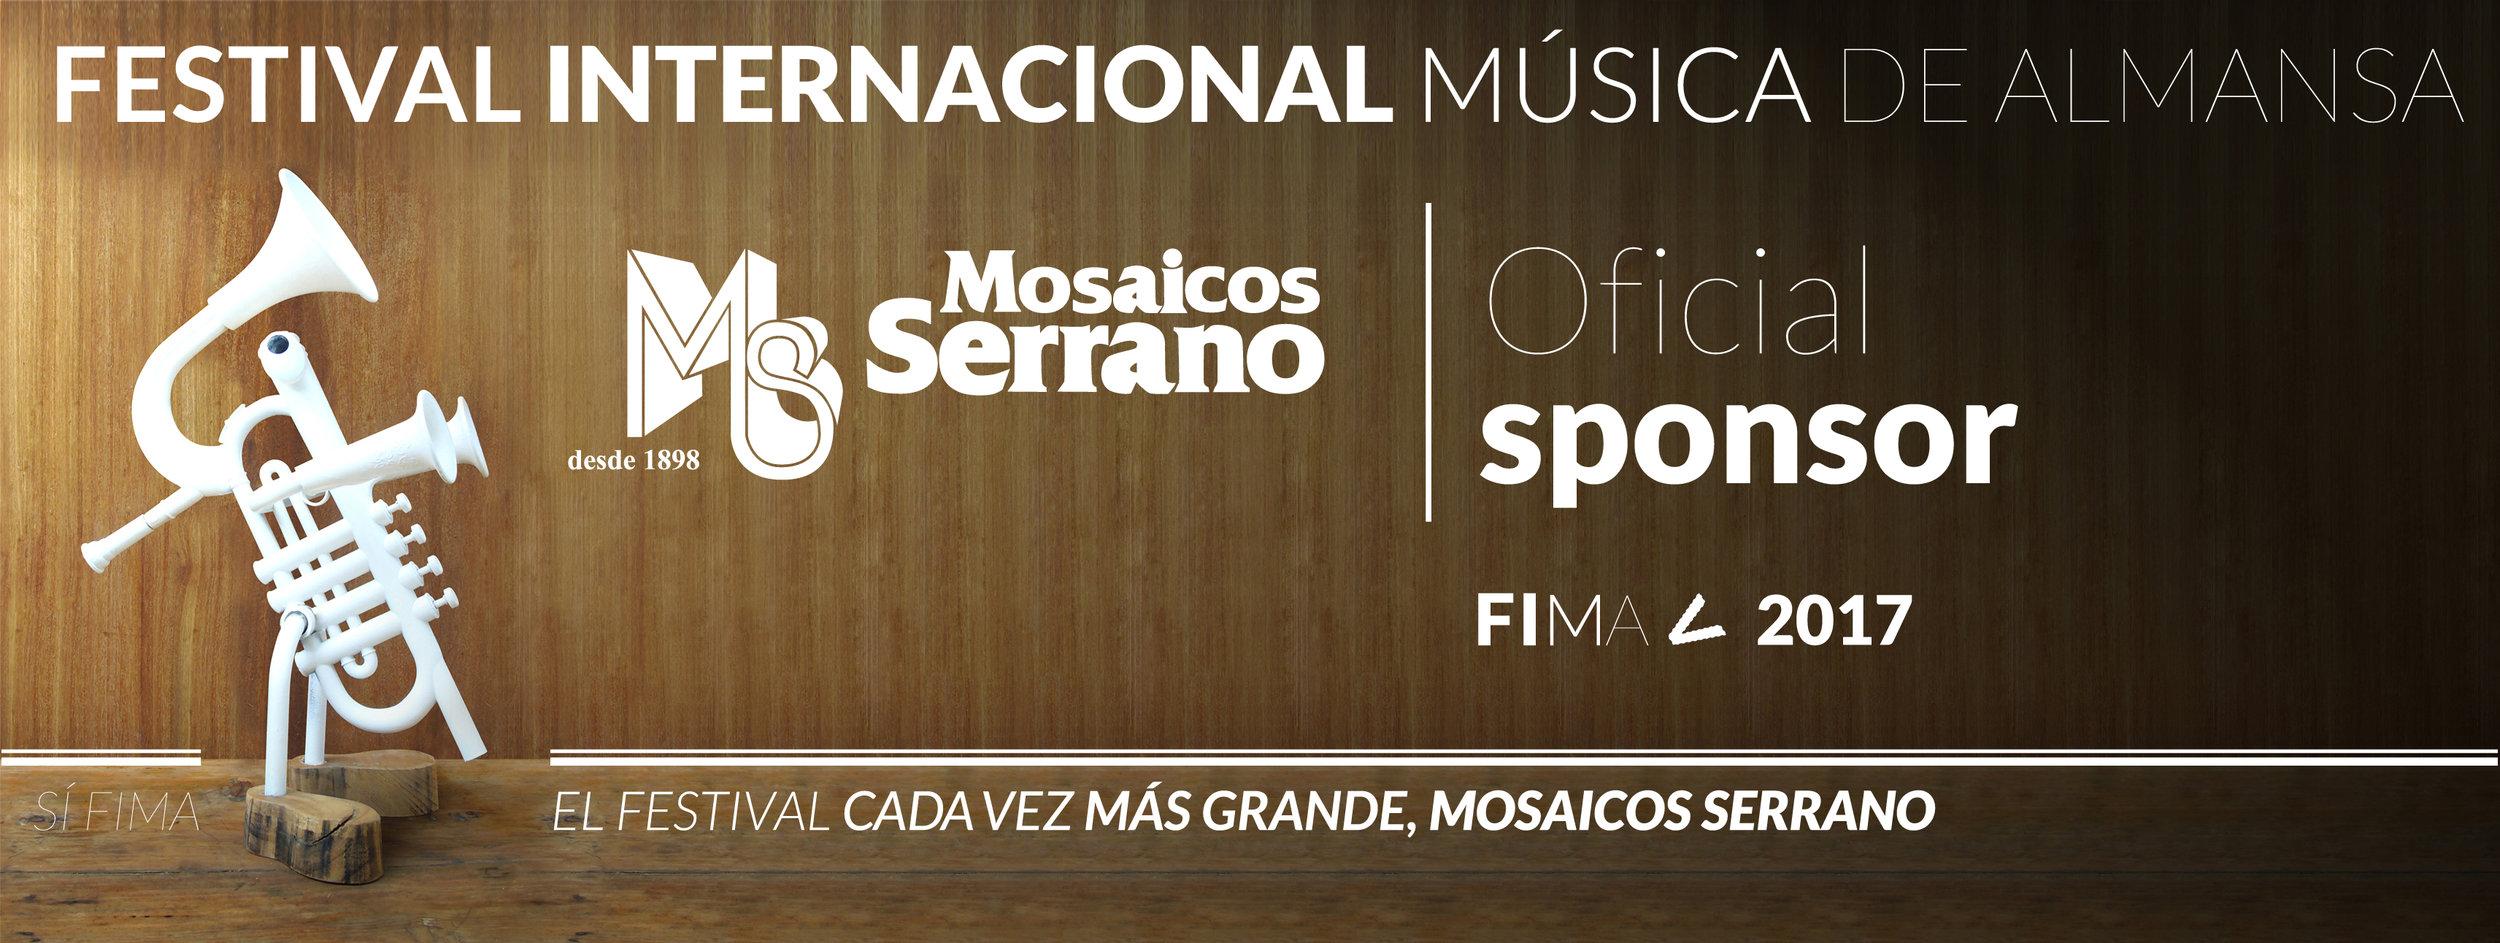 12_sponsor_mosaicos_serrano.jpg